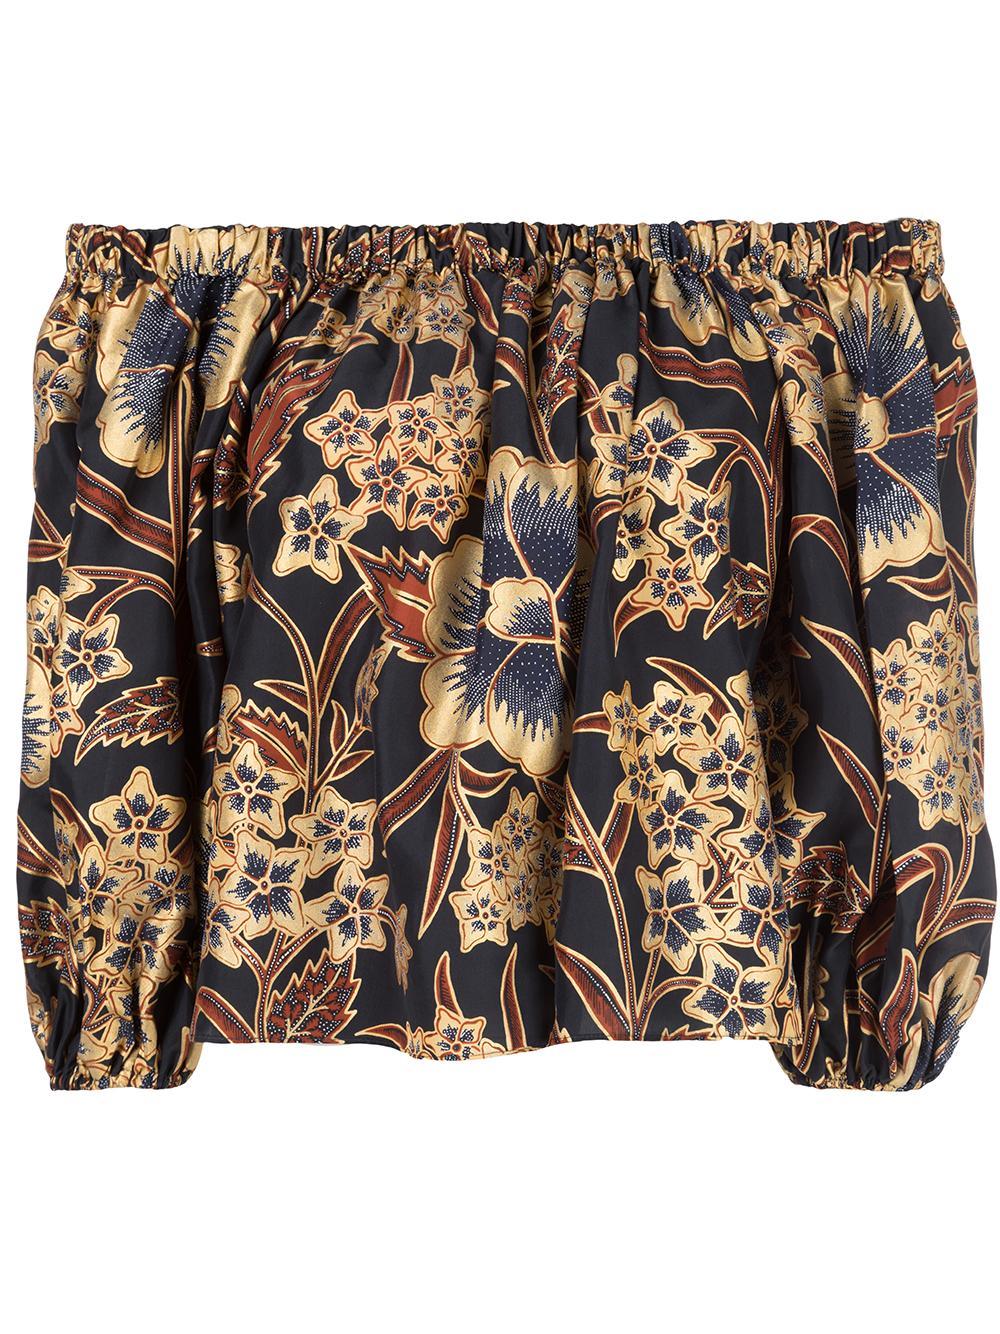 Amoy Glided Floral Silk Off Shoulder Top Item # FA190245